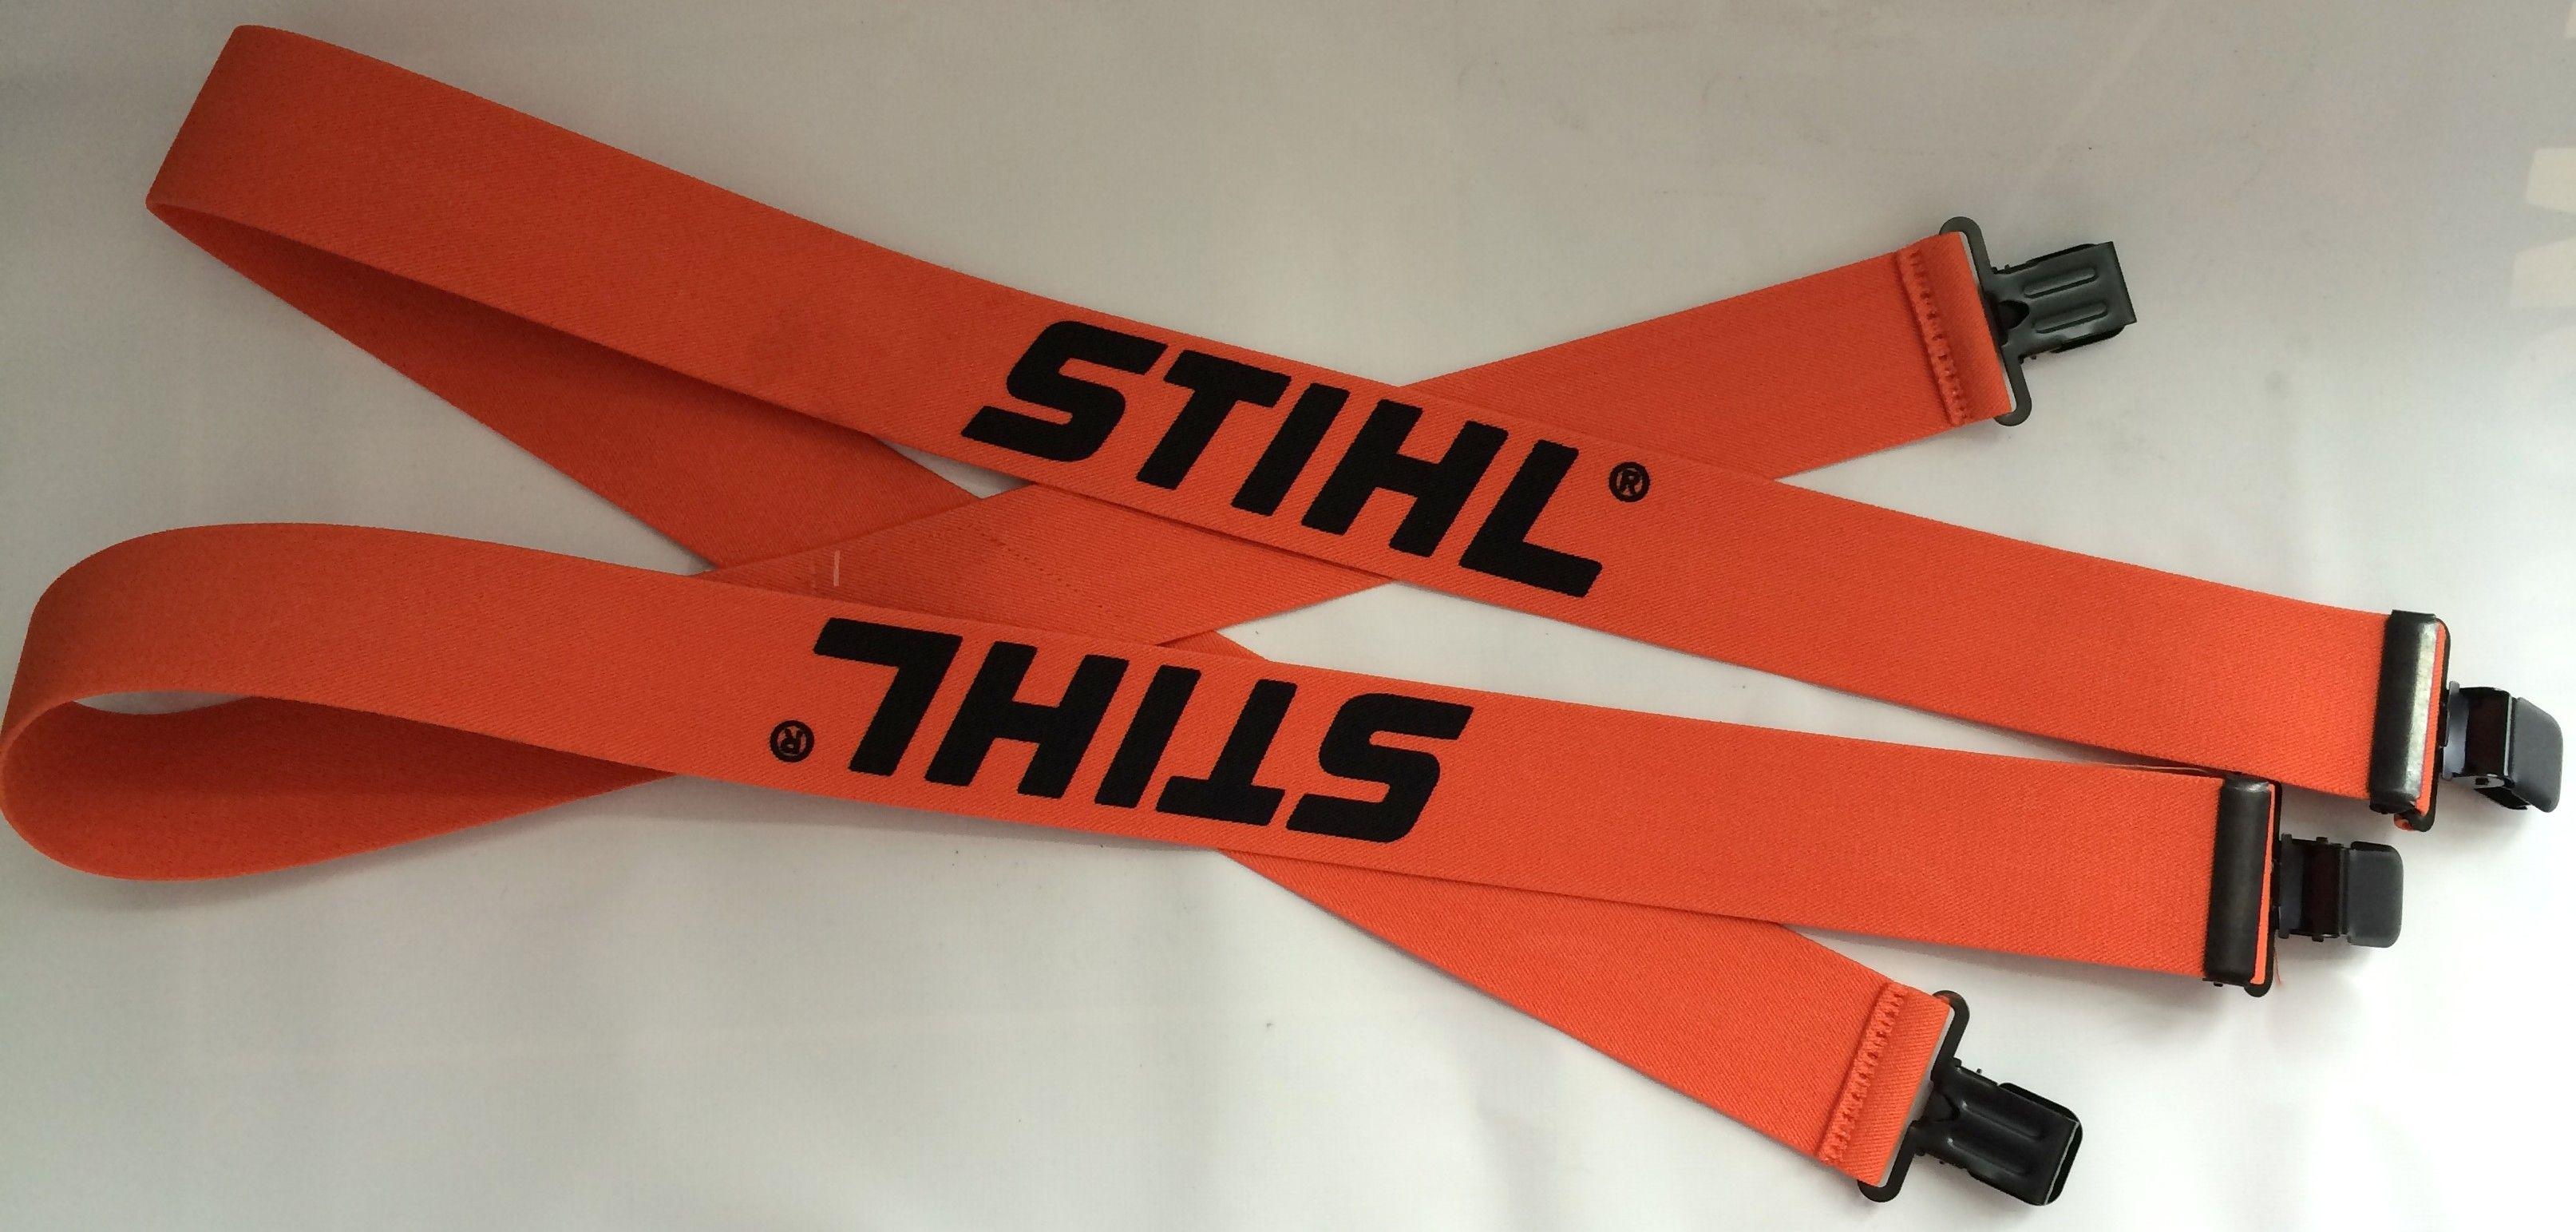 STIHL Suspenders model 7002 885 1500